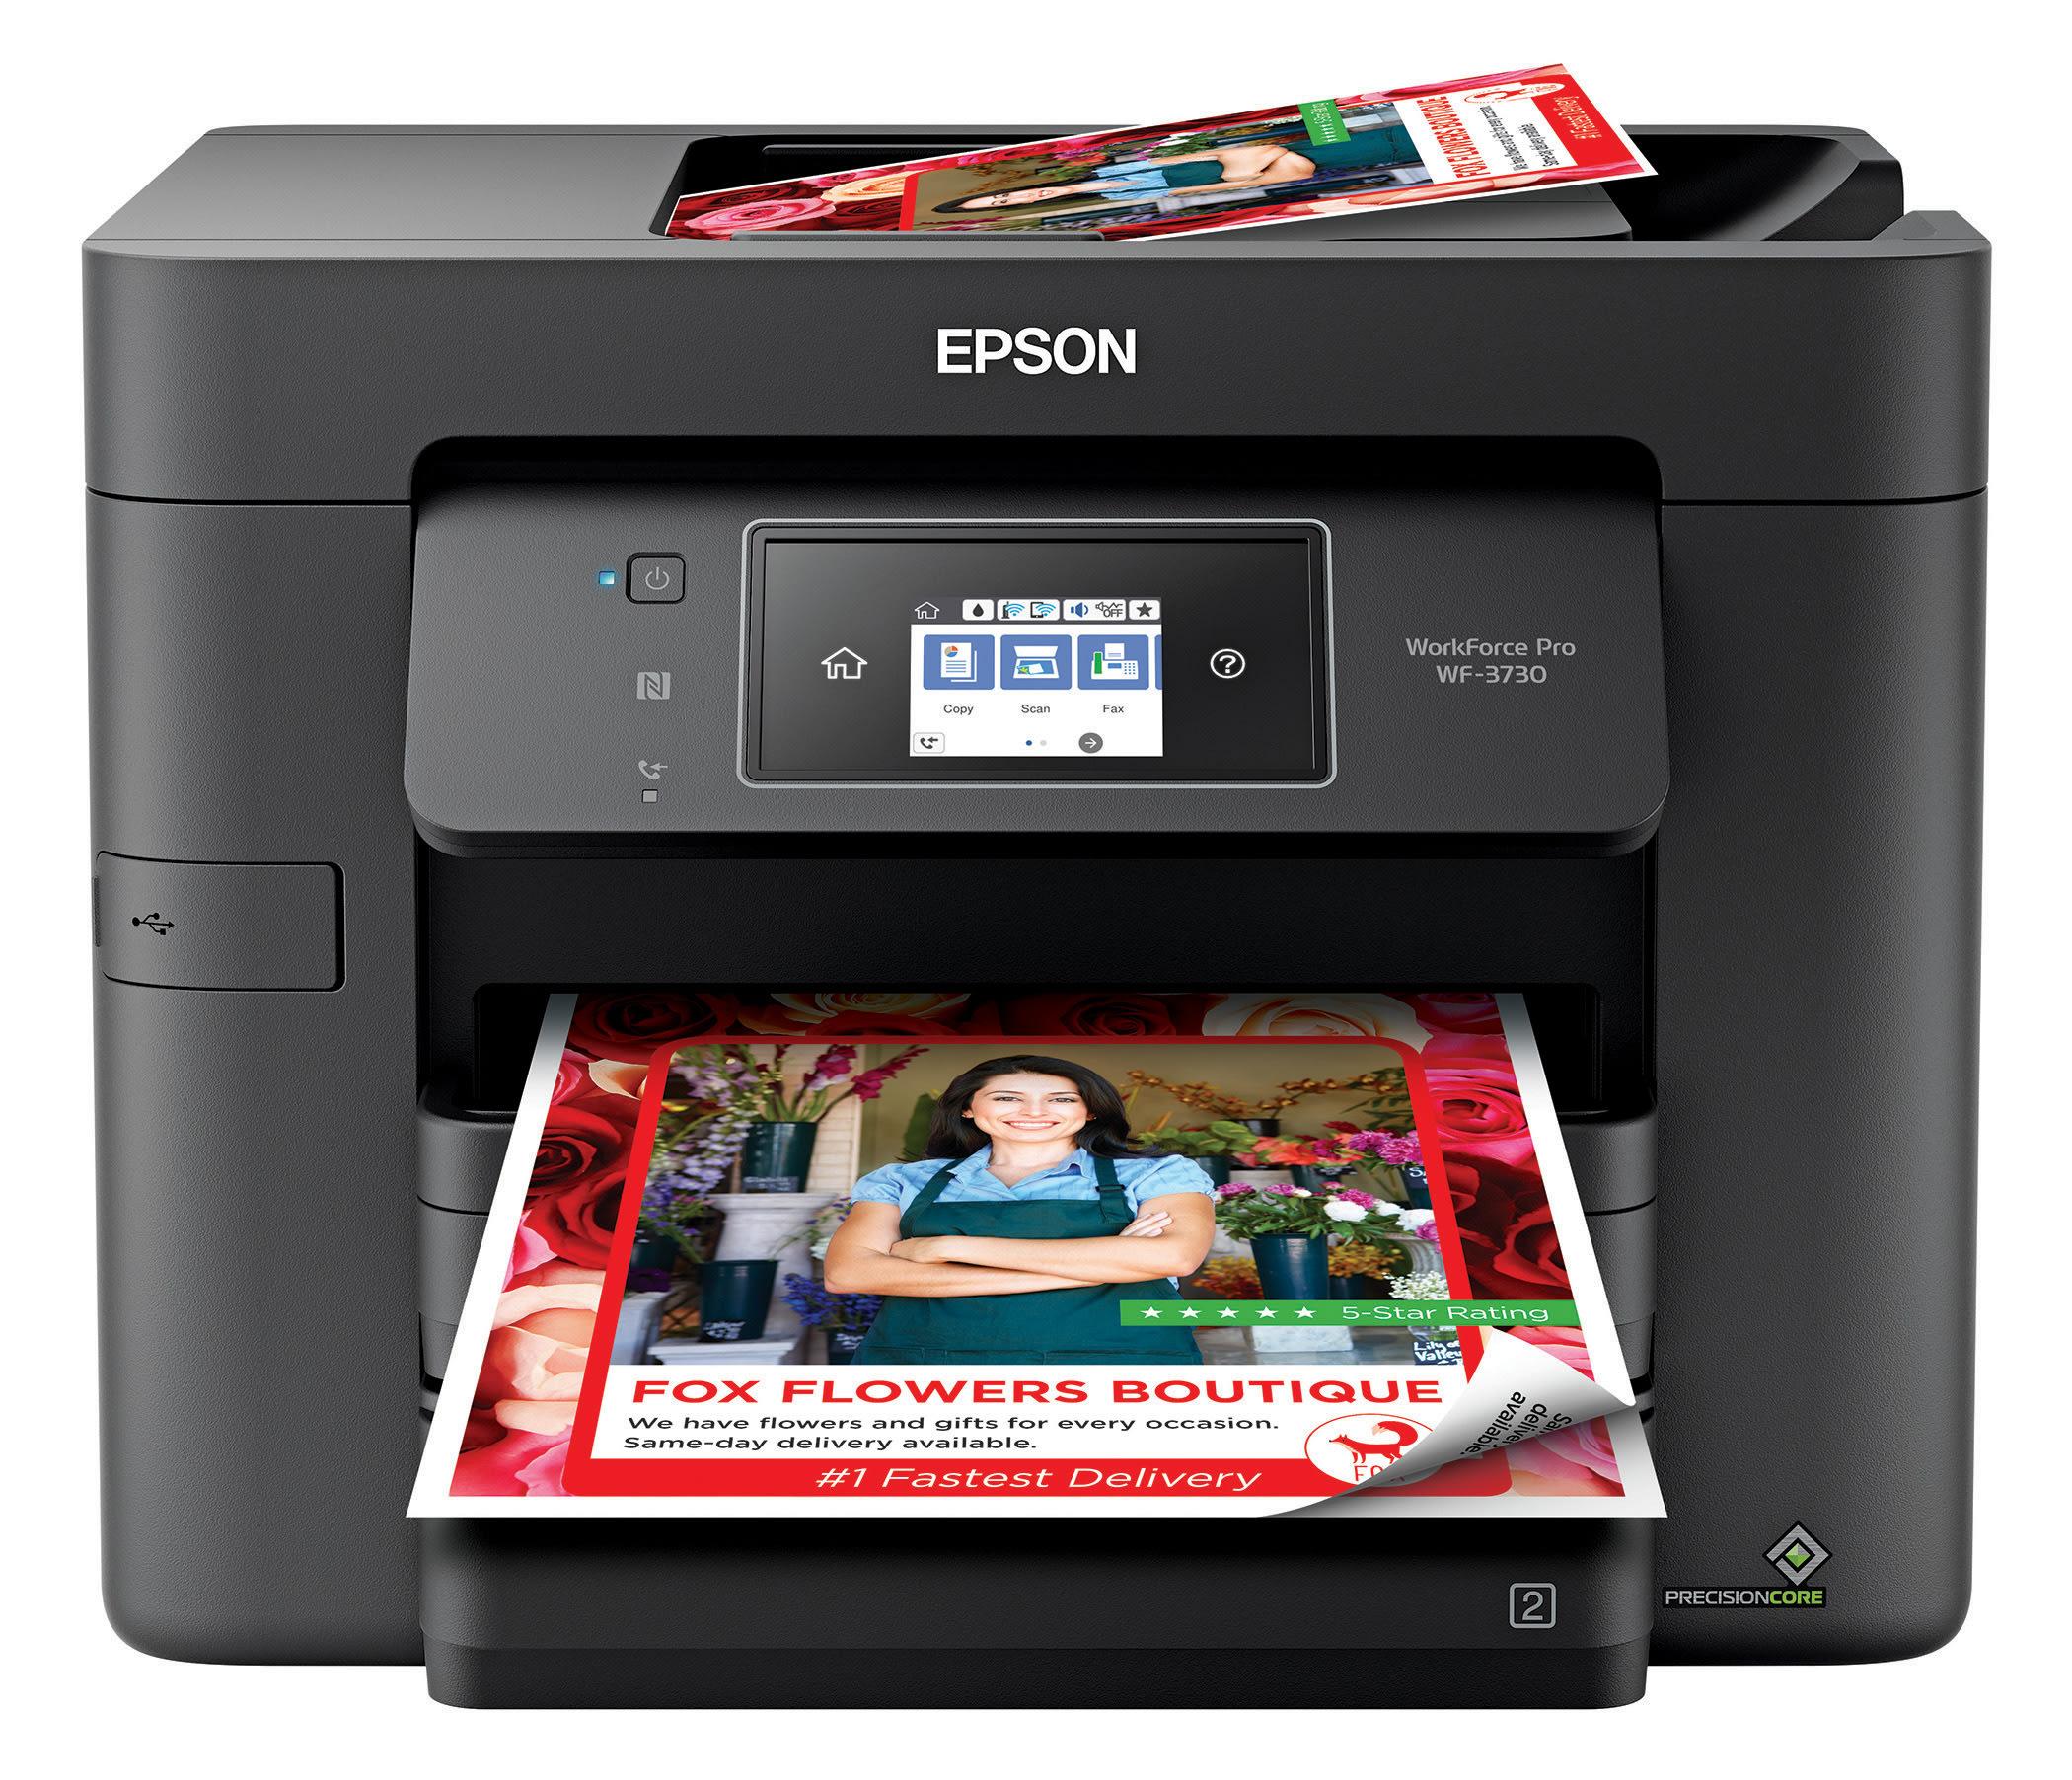 Epson® WorkForce® Pro WF-3730 Wireless InkJet All-In-One Color Printer